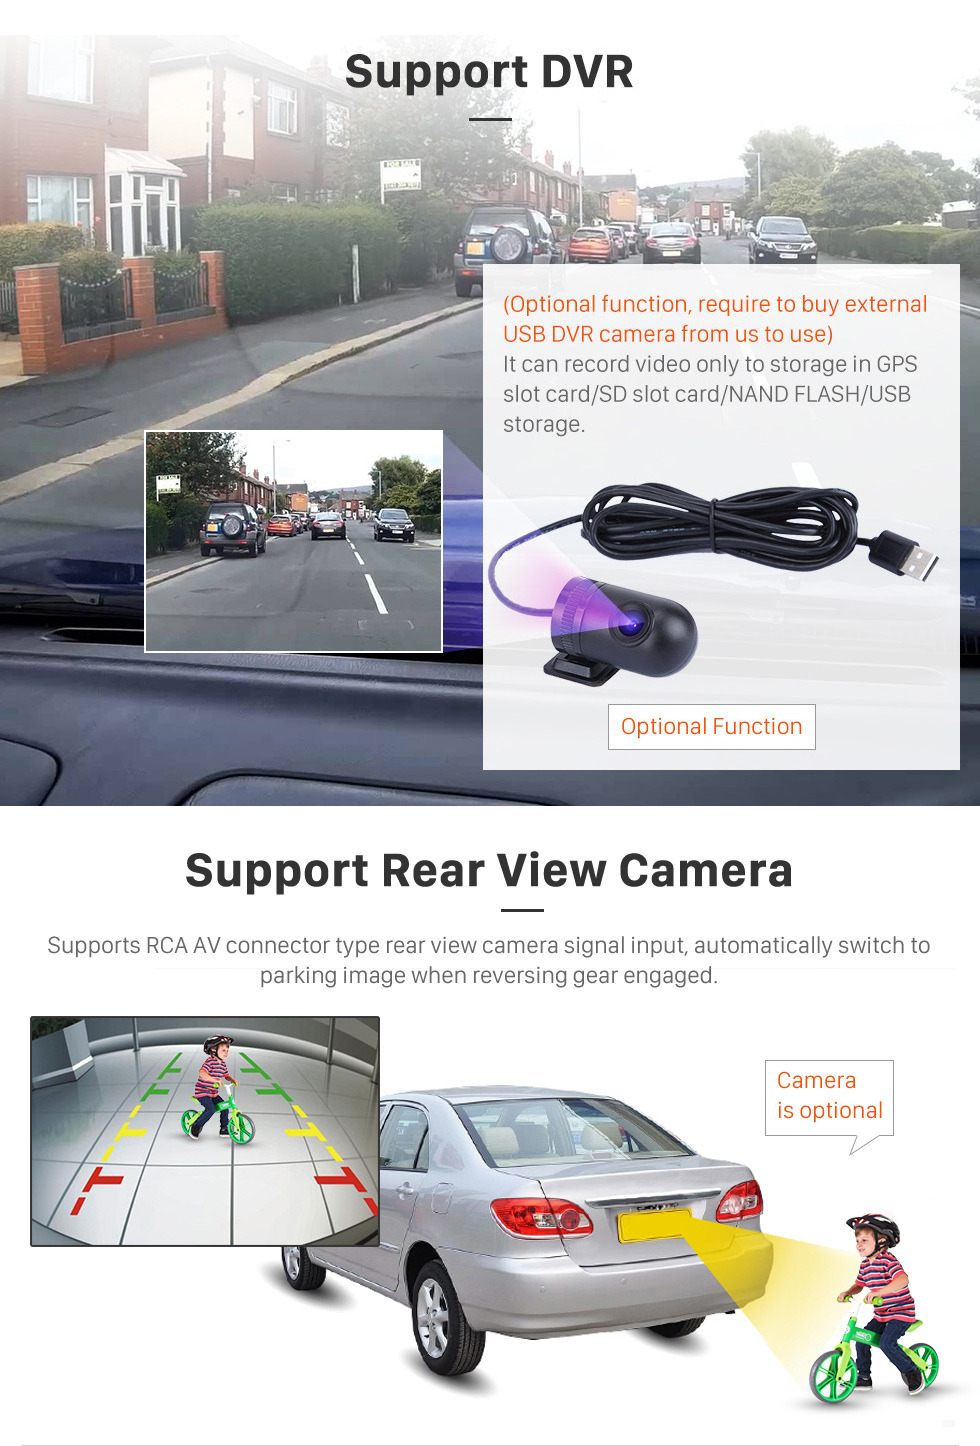 Seicane 9 inch 2015 Hyundai Starex H1 Android 10.0 GPS Navigation Radio Bluetooth HD Touchscreen AUX USB Carplay support Mirror Link